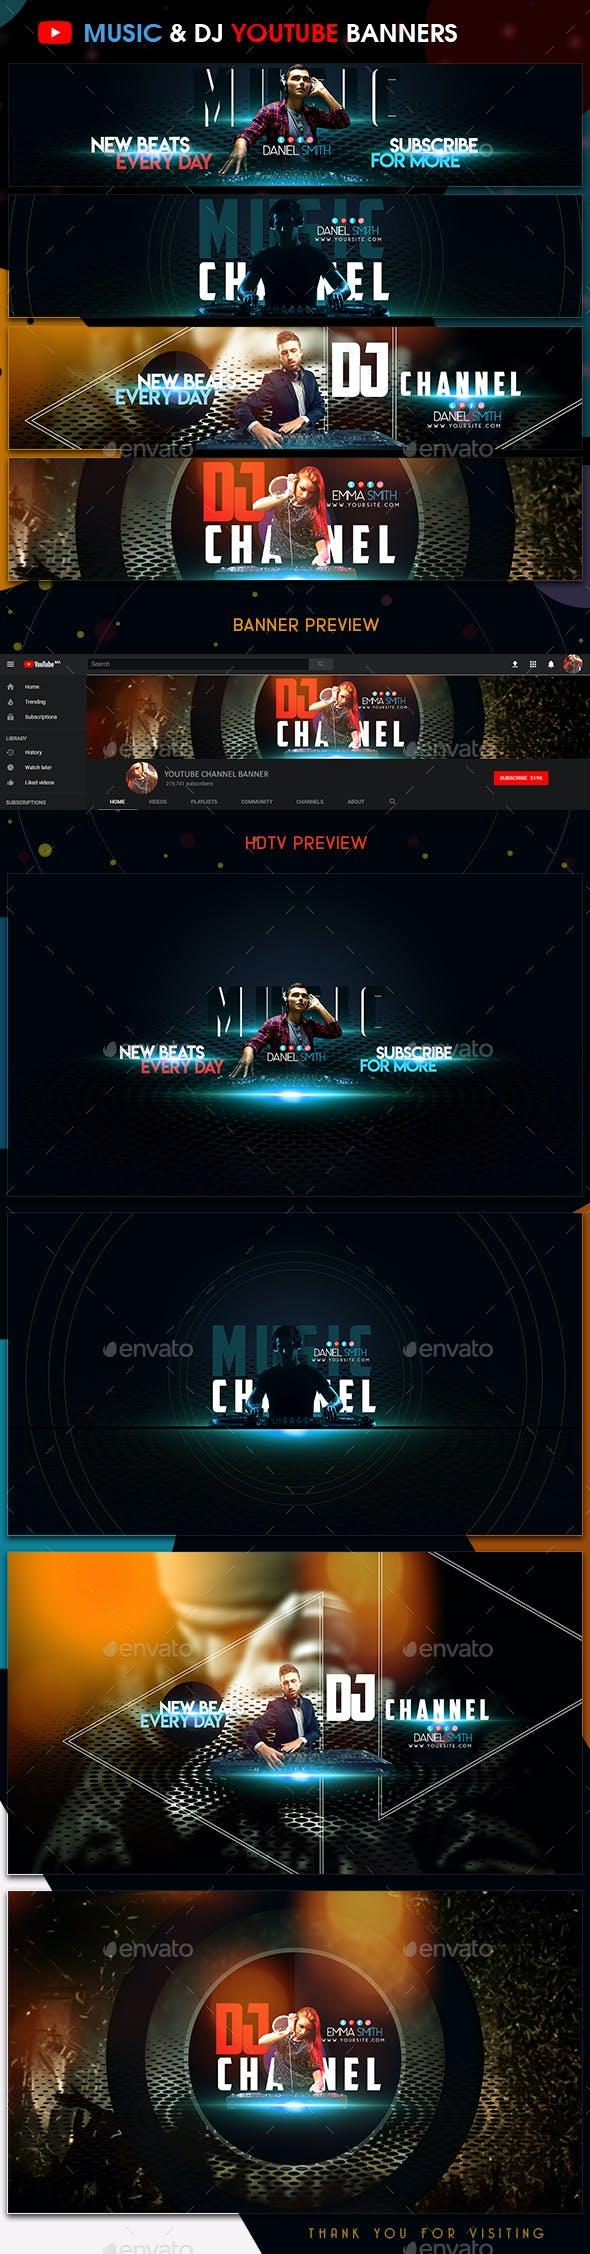 Music & DJ YouTube Banners